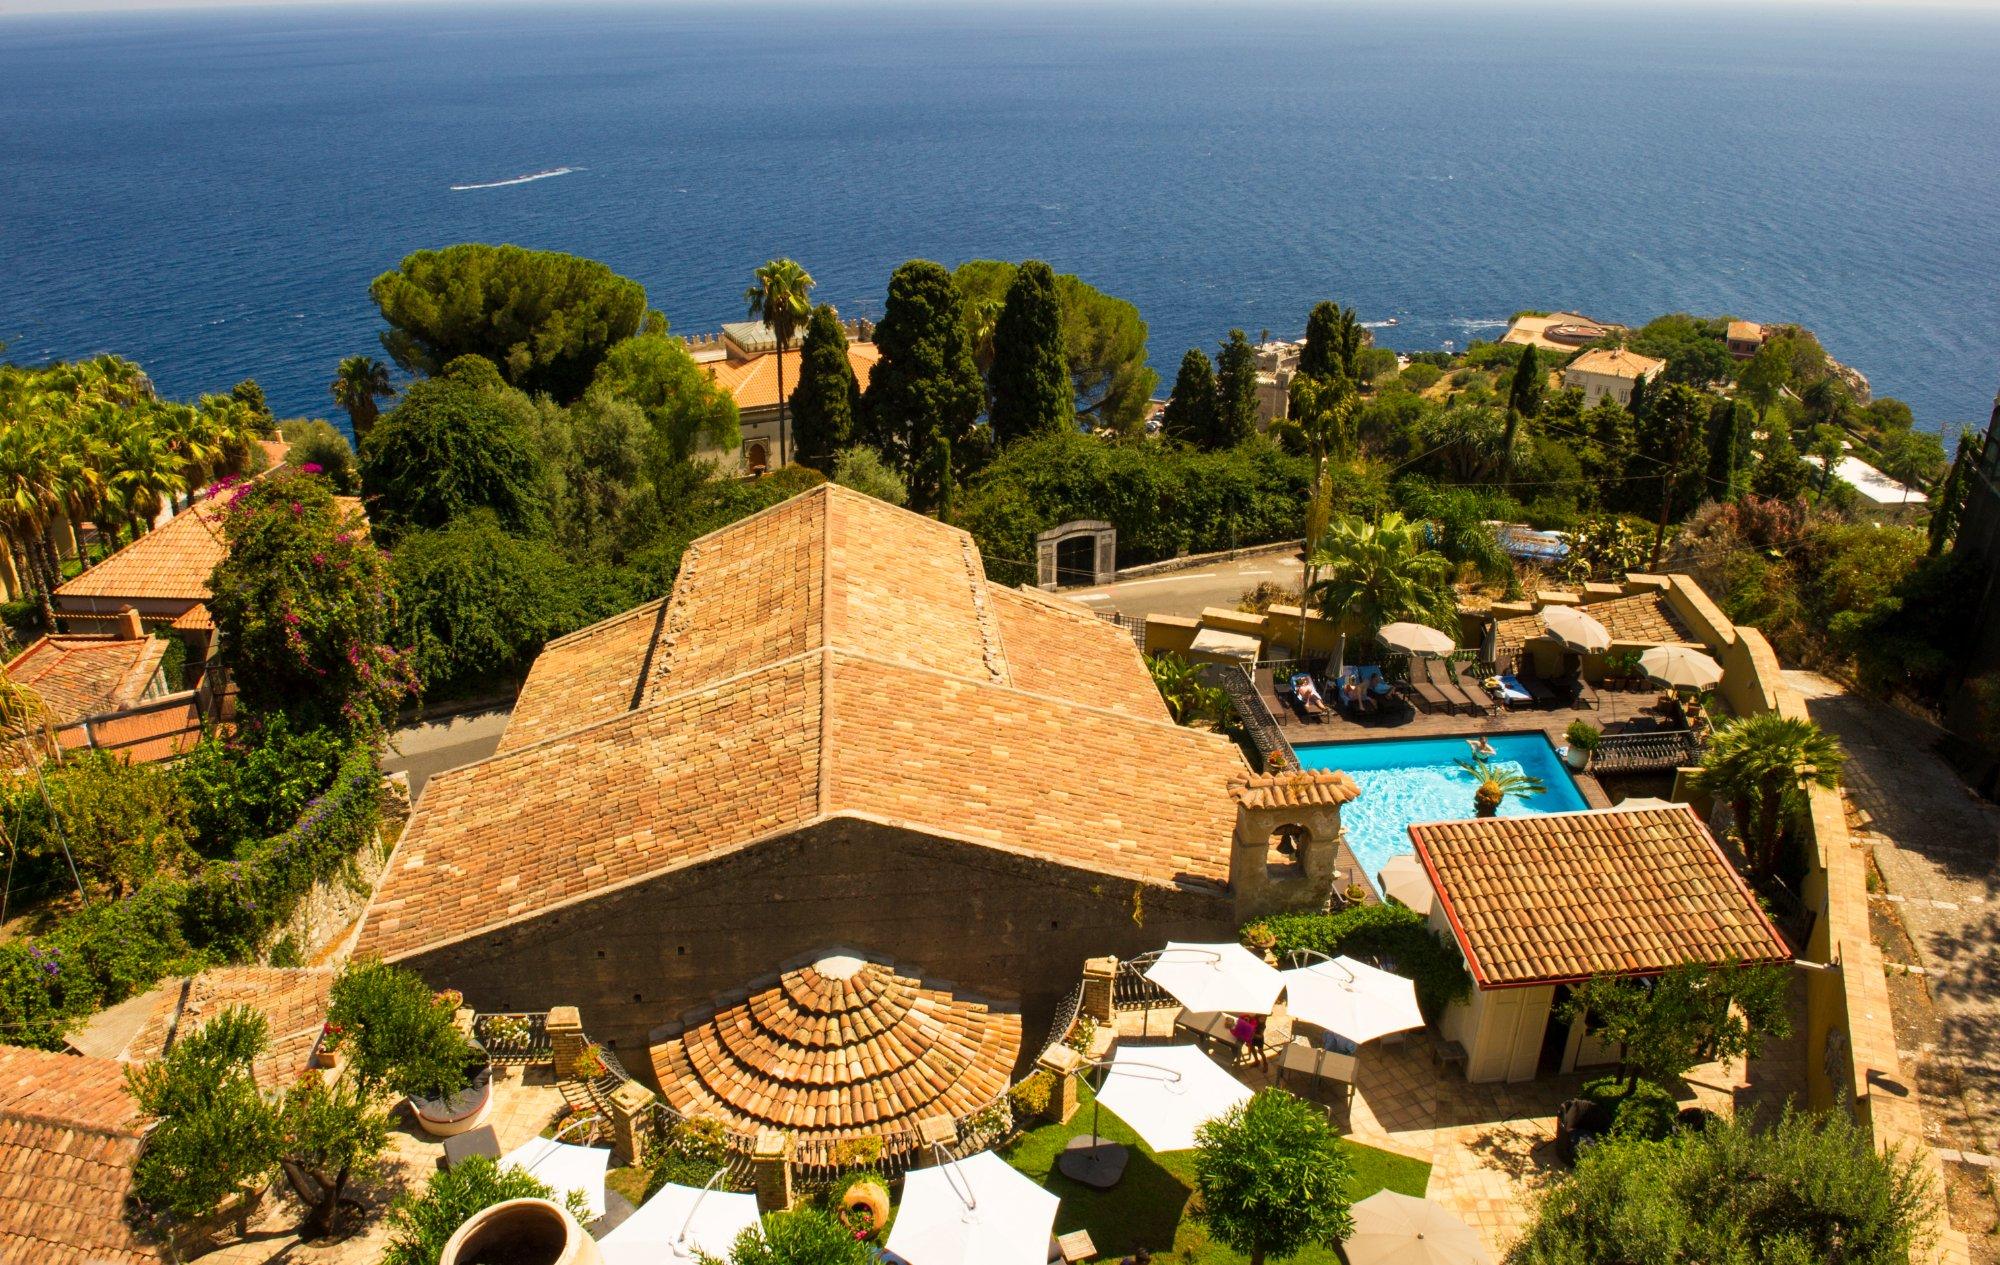 Hotel villa carlotta taormina itali foto 39 s reviews en prijsvergelijking tripadvisor - Kamer timeo ...